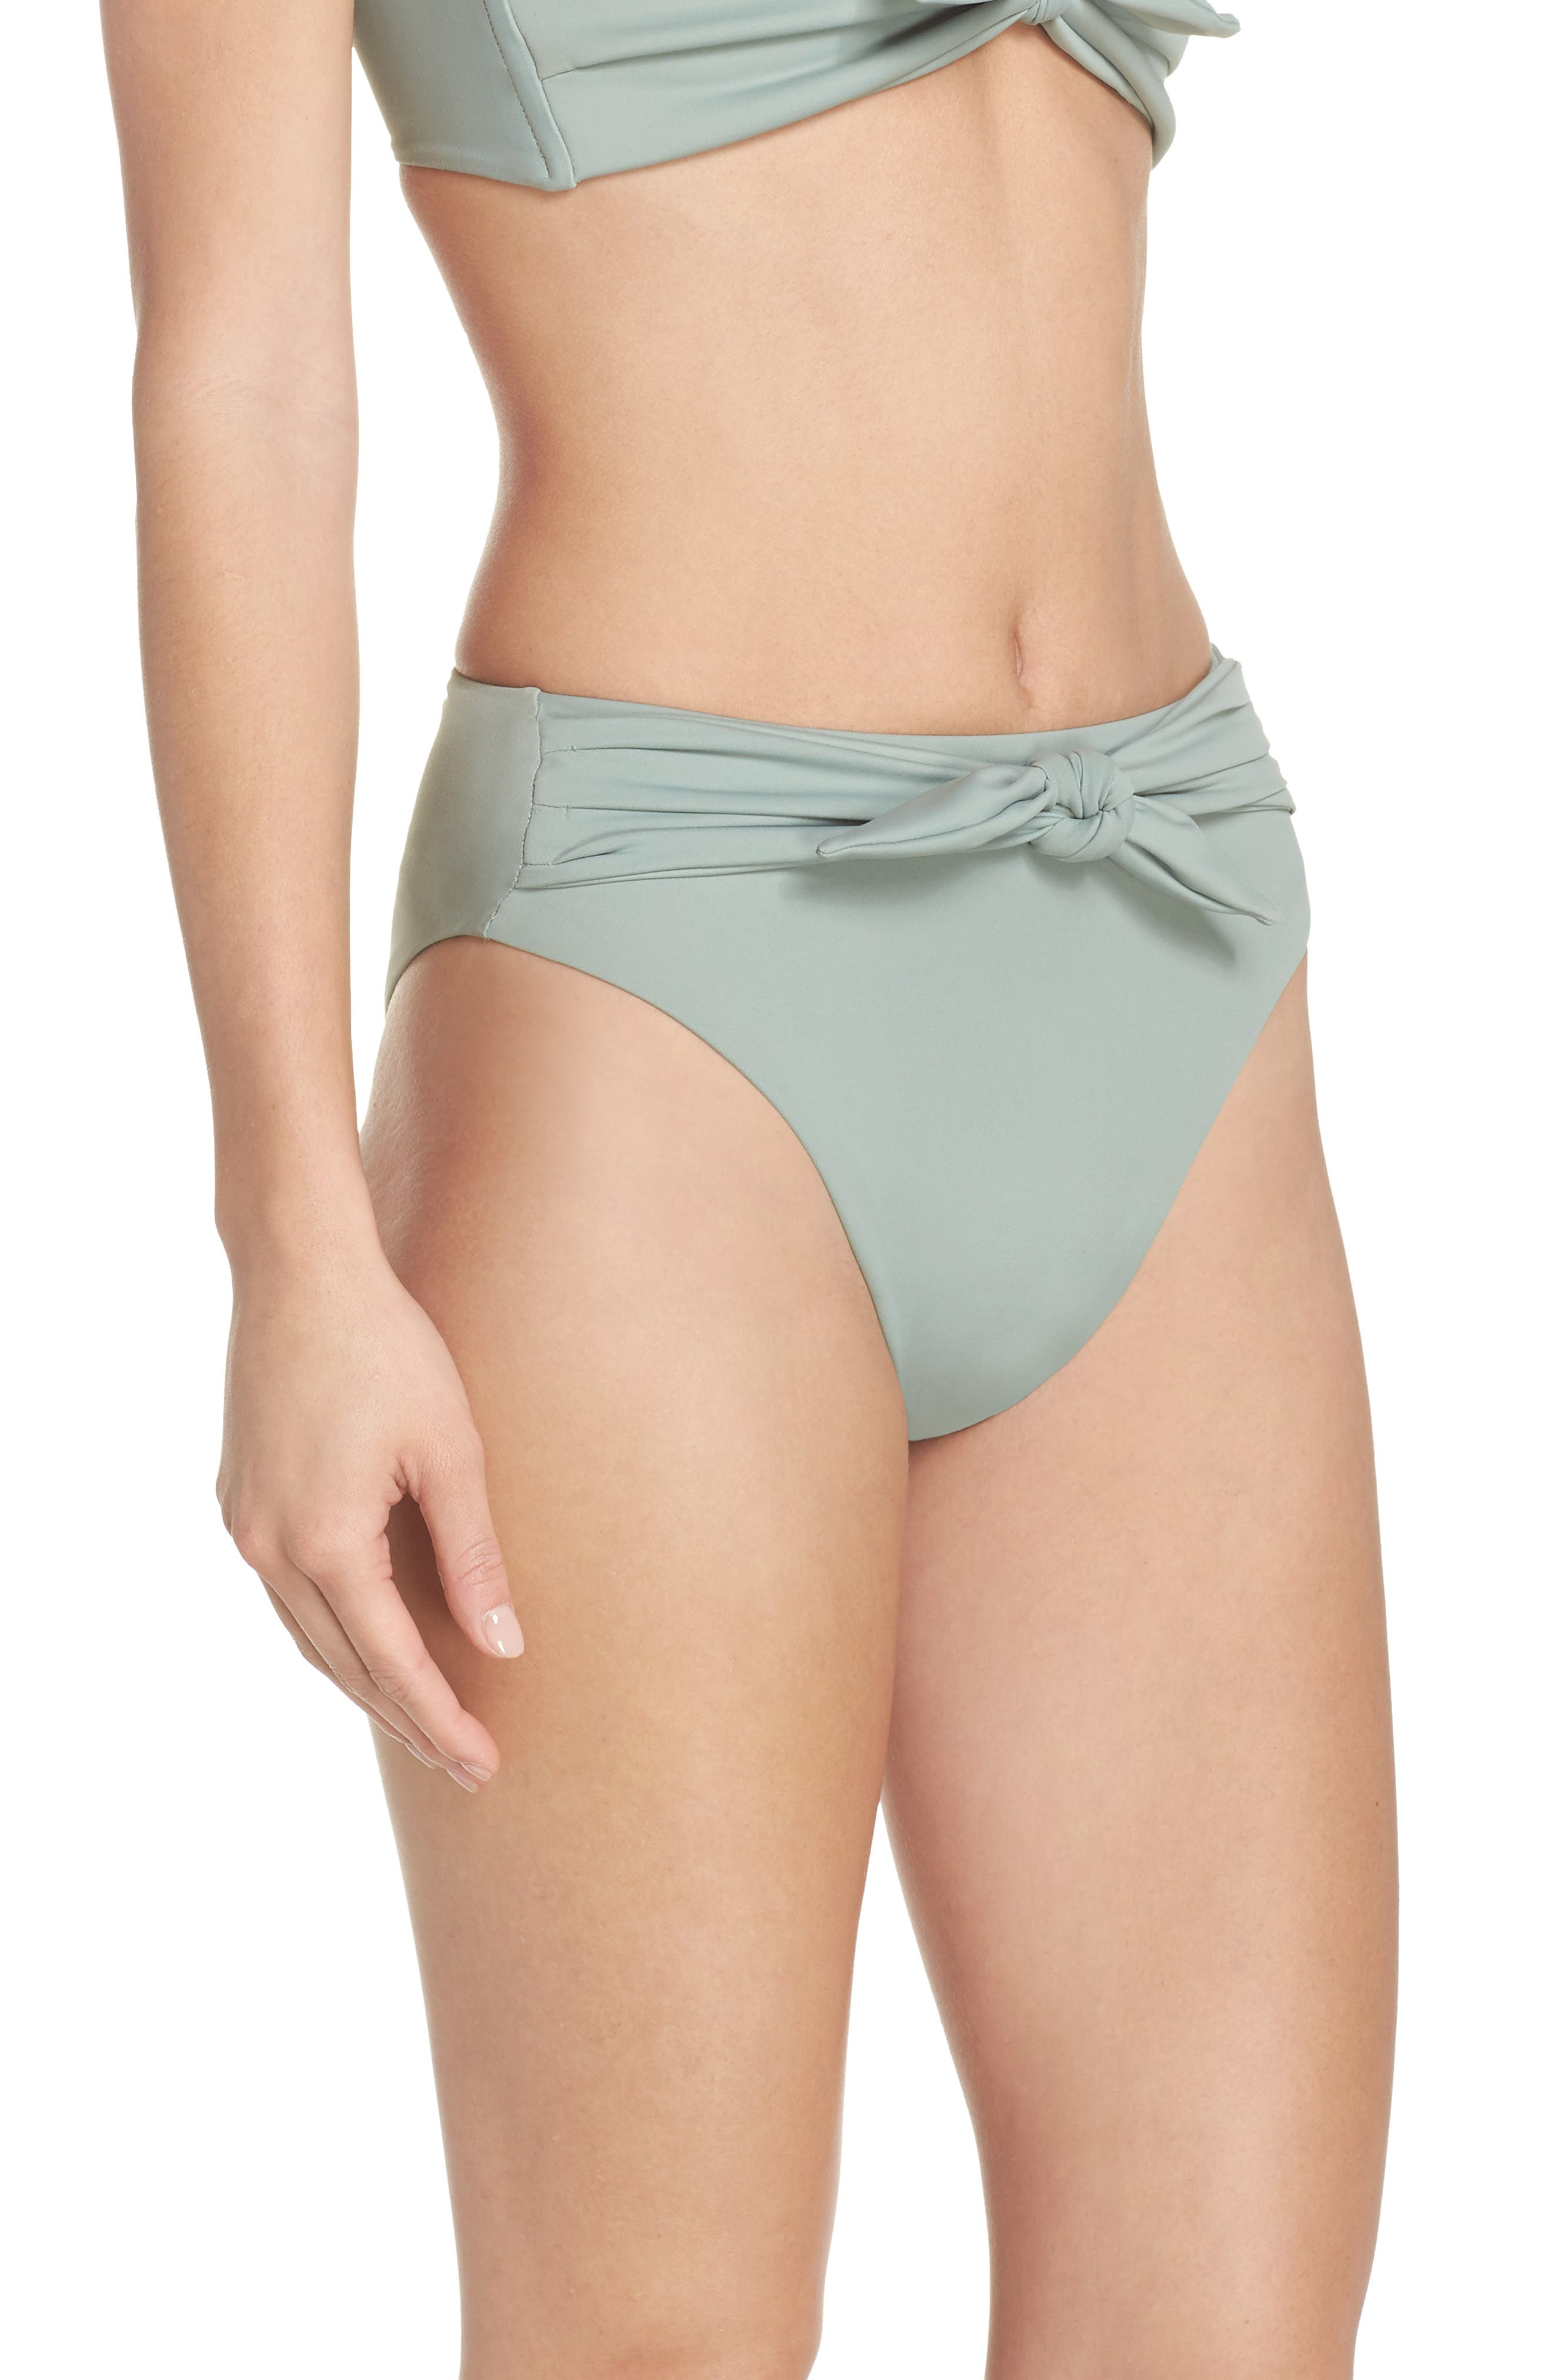 Paula Tie-Up Bikini Bottoms,                             Alternate thumbnail 3, color,                             Pistache Green